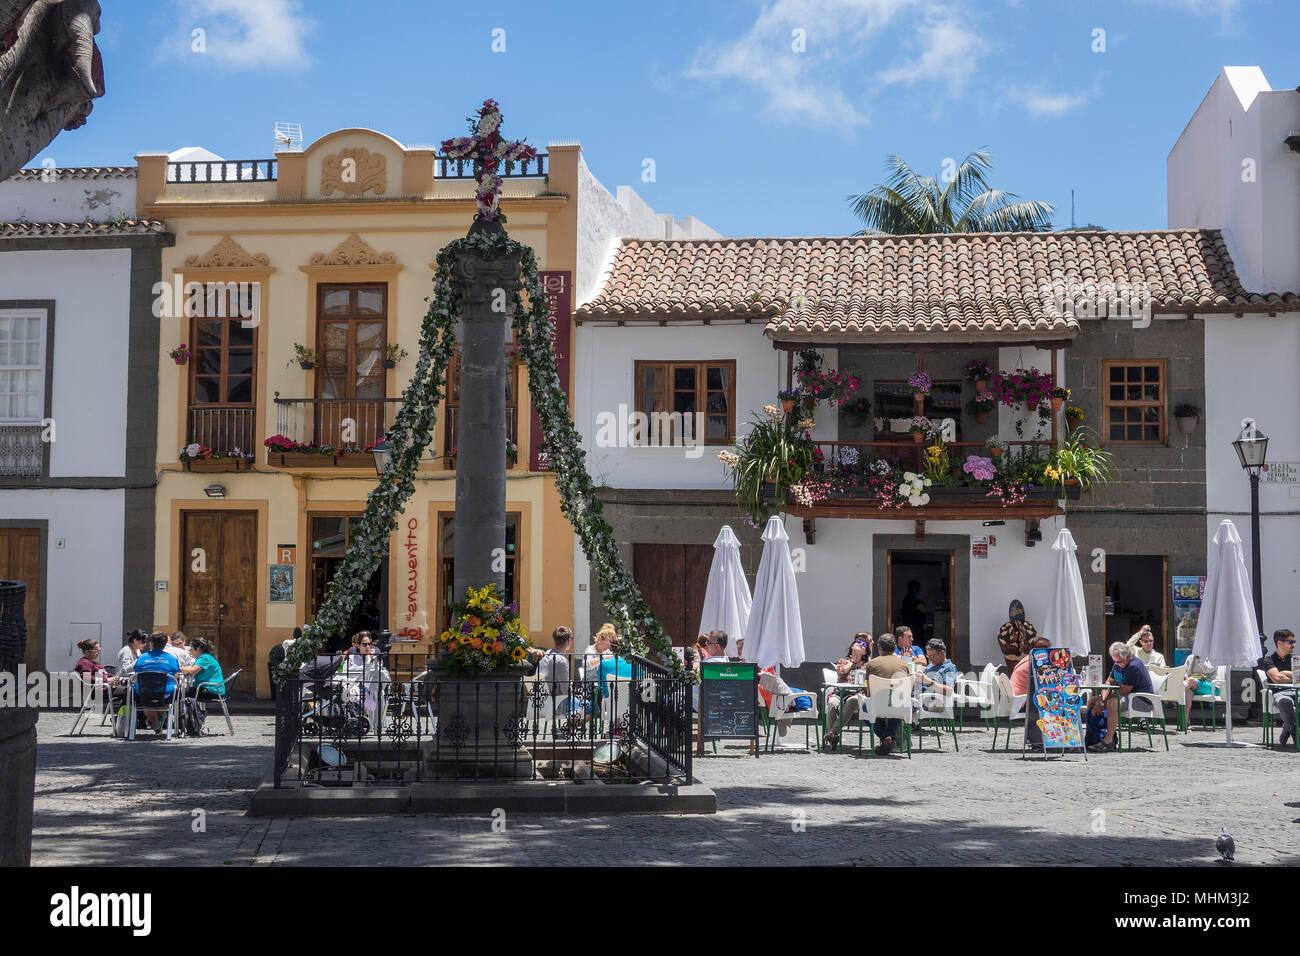 Spanien, Gran Canaria, Telde,, Cafés in Basilica Square Stockbild